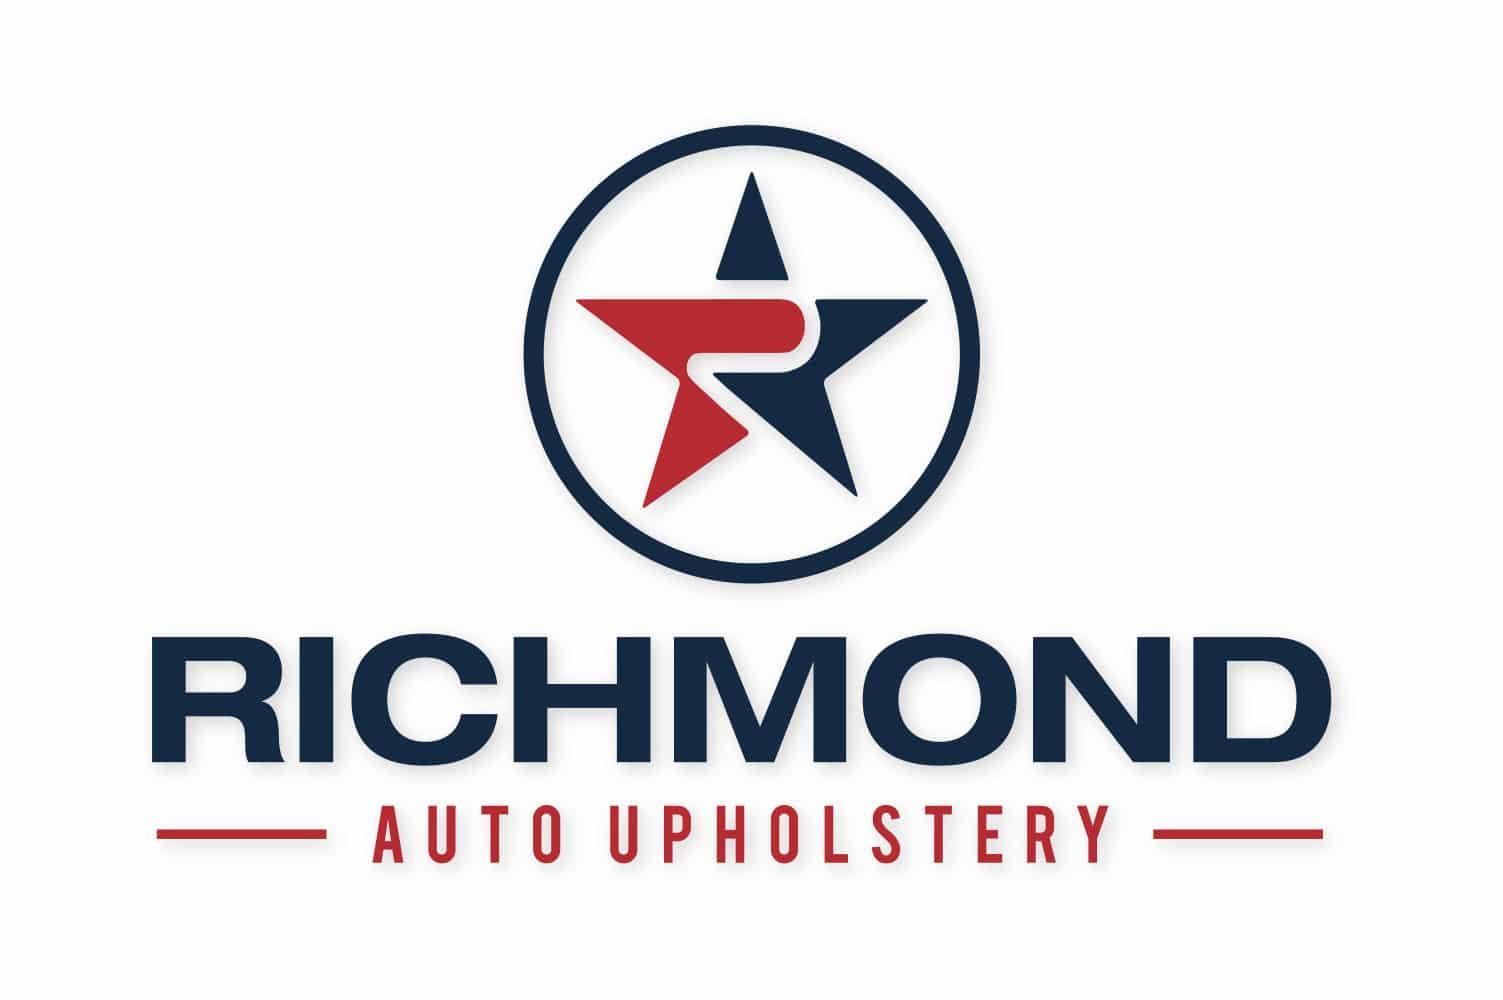 richmond-auto-upholstery-logo